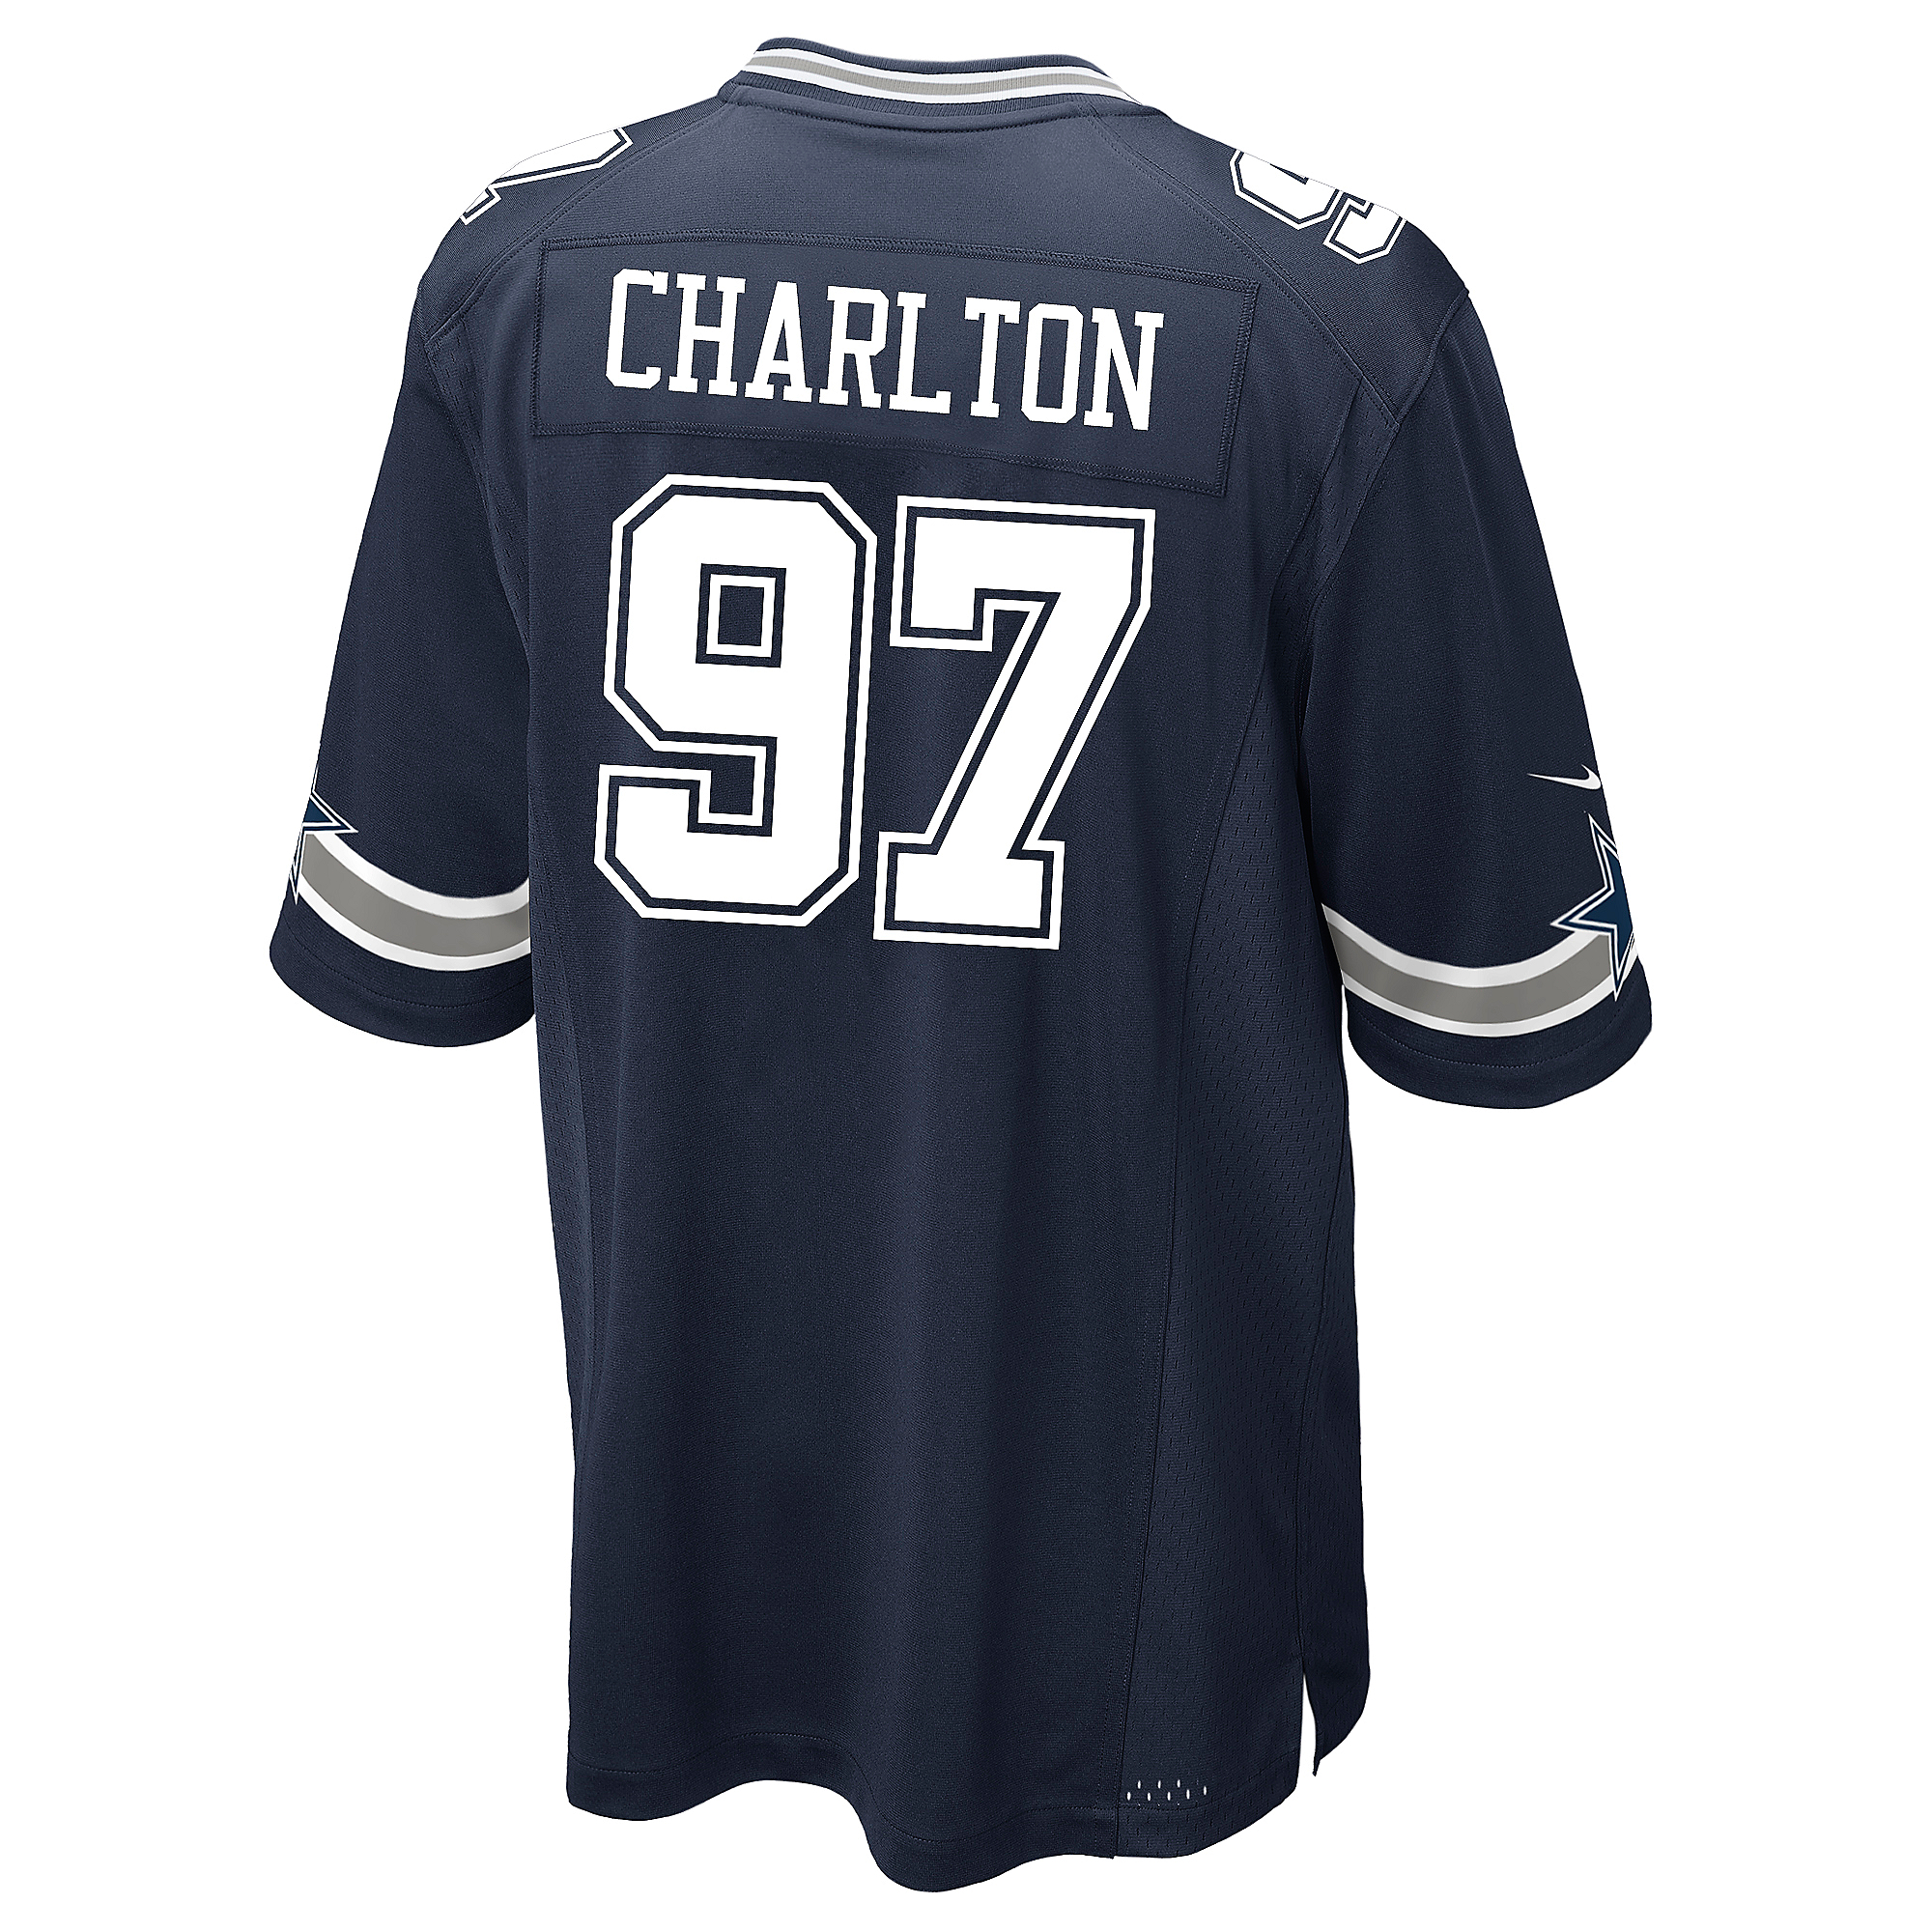 Dallas Cowboys Taco Charlton Nike Navy Game Replica Jersey  a4d0f5e8b